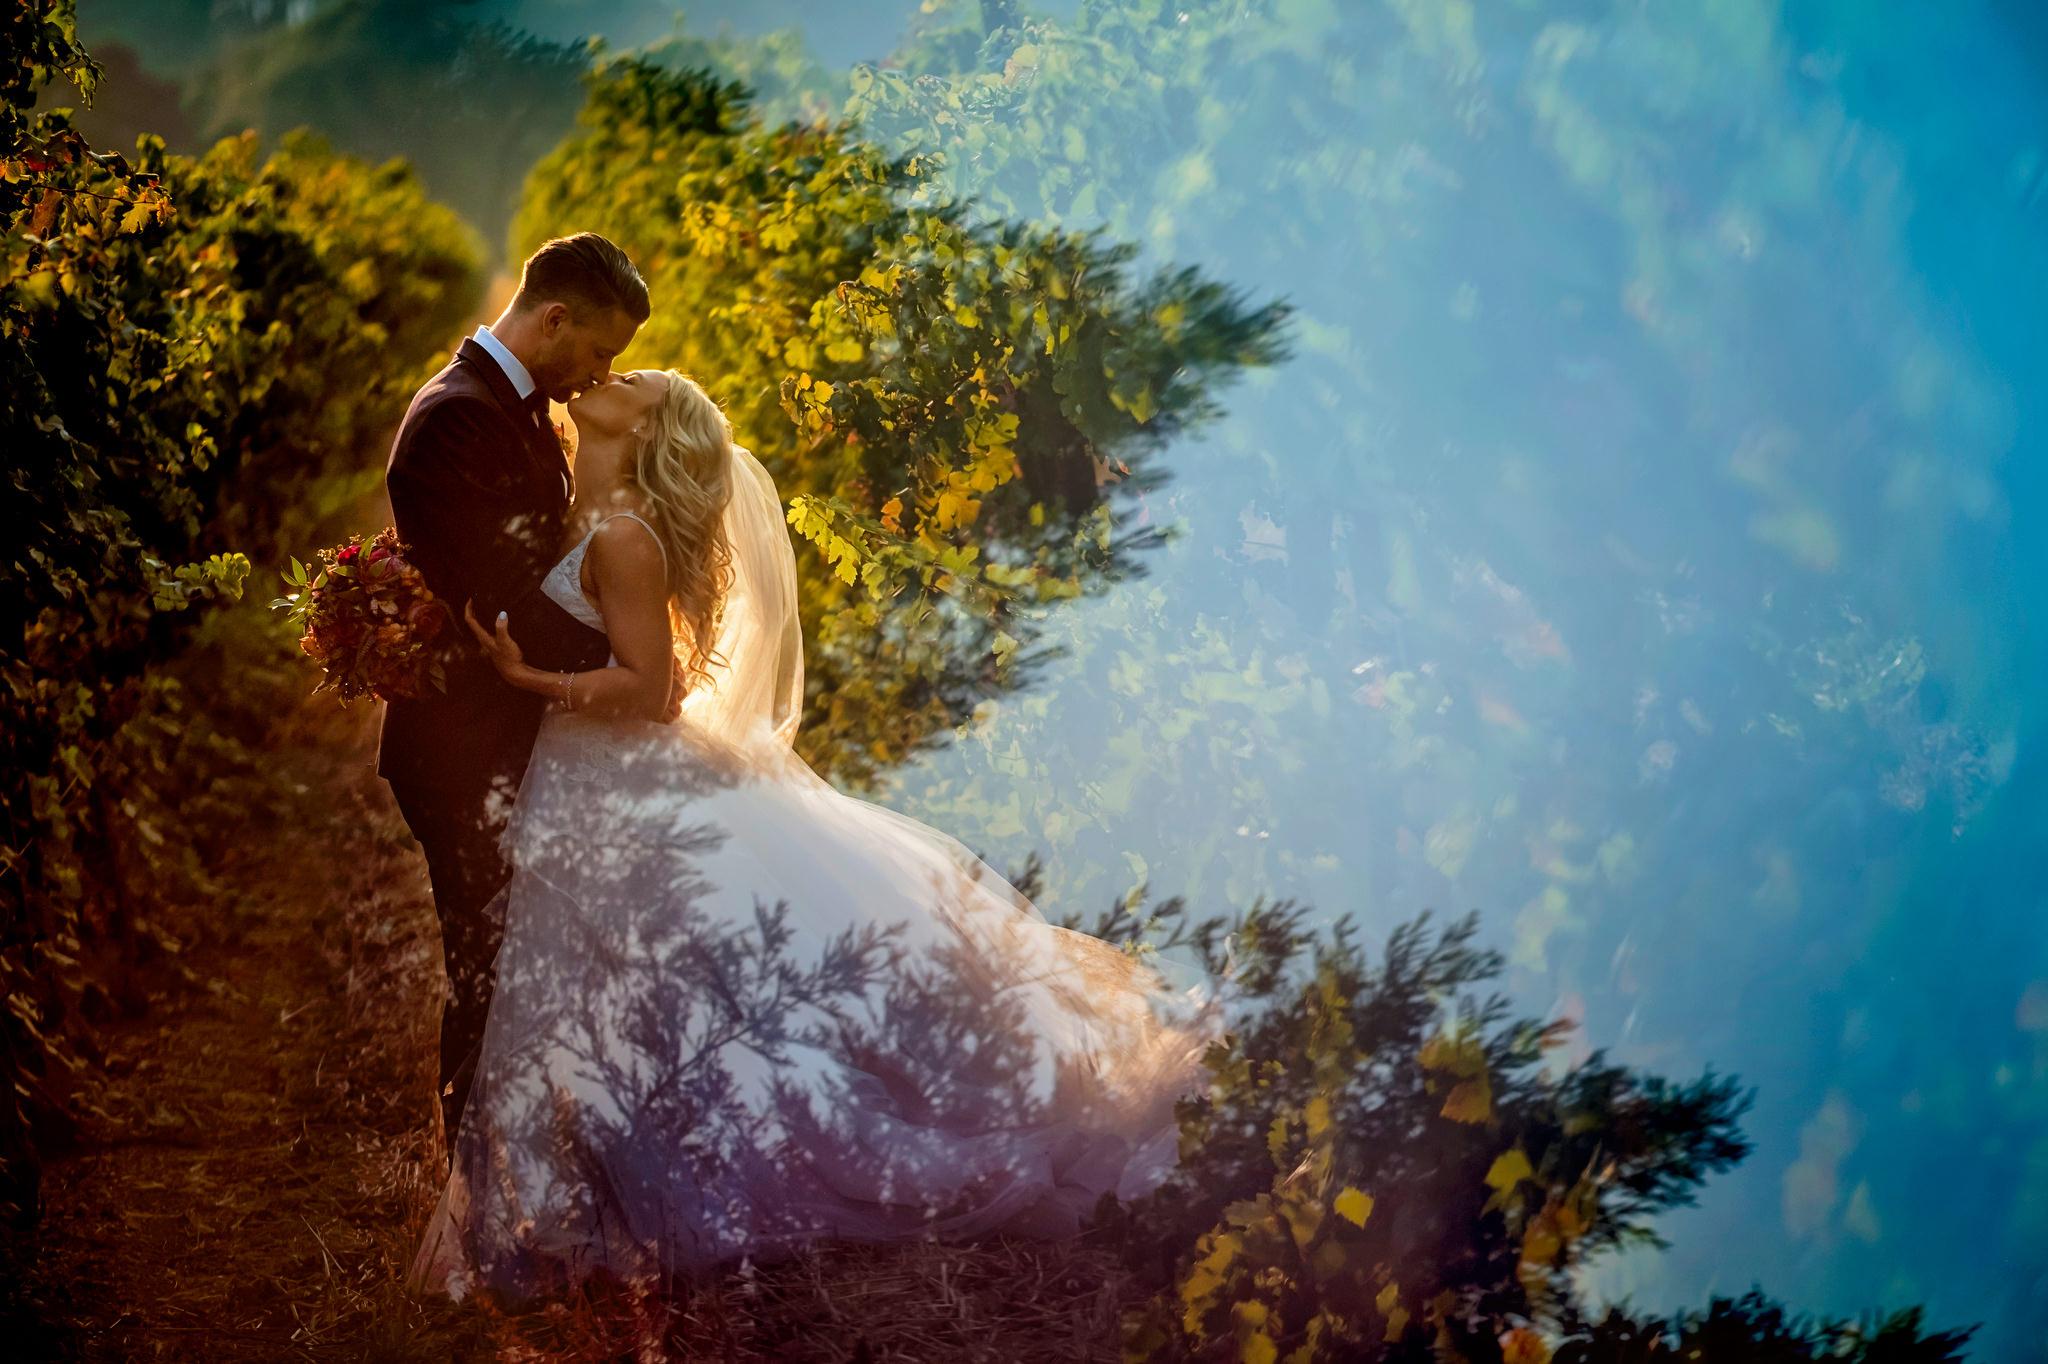 50 best wedding portraits of the decade - Ben Chrisman - Chrisman Studios